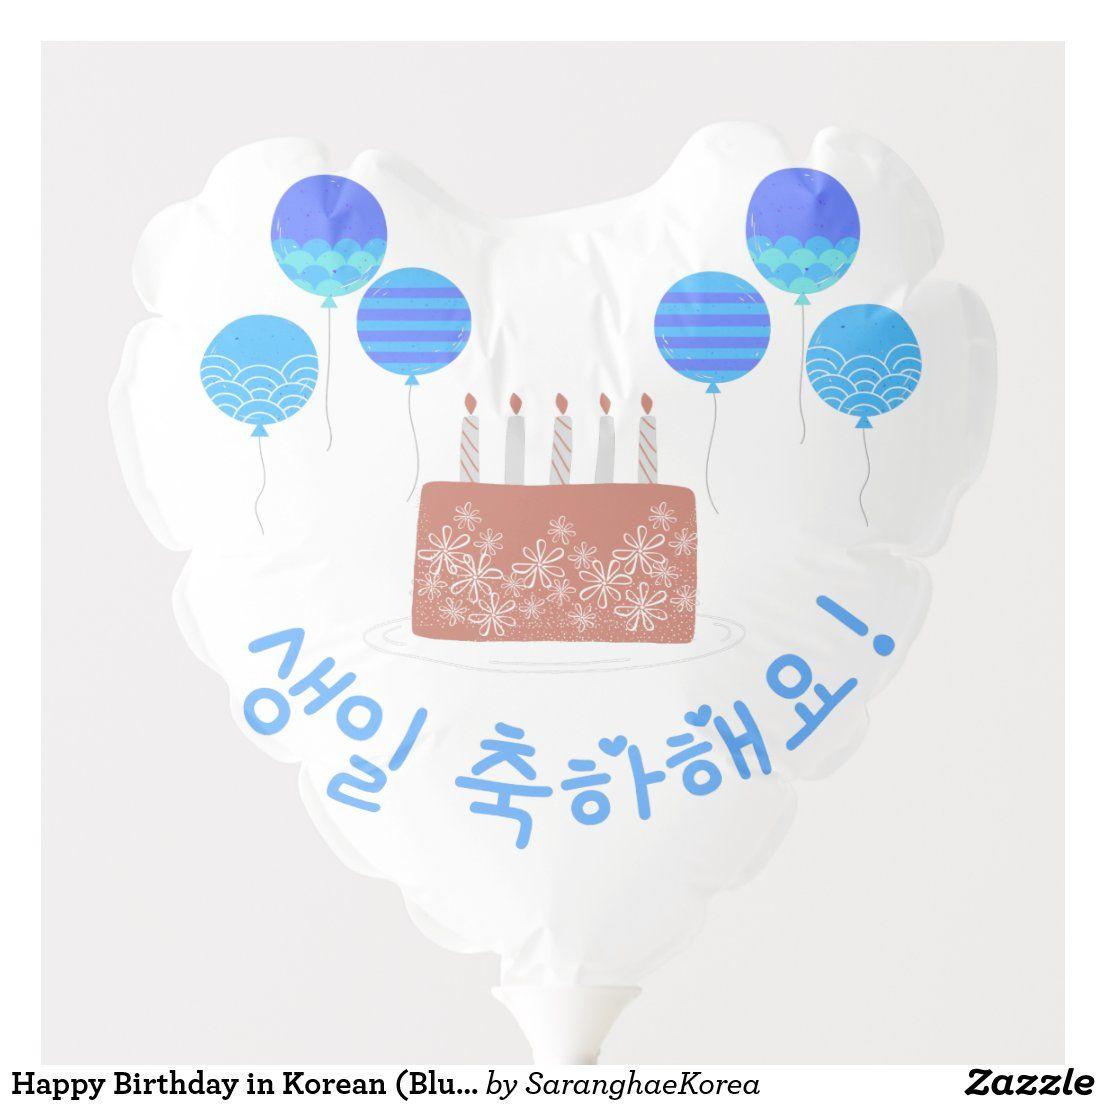 Happy Birthday Card In Korean Printable Korean Alphabet Hangul Card Hangul Birthday Card Korean Gift Bday Card Pdf Jpeg Digital Happy Birthday Cards Korean Alphabet Korean Gift